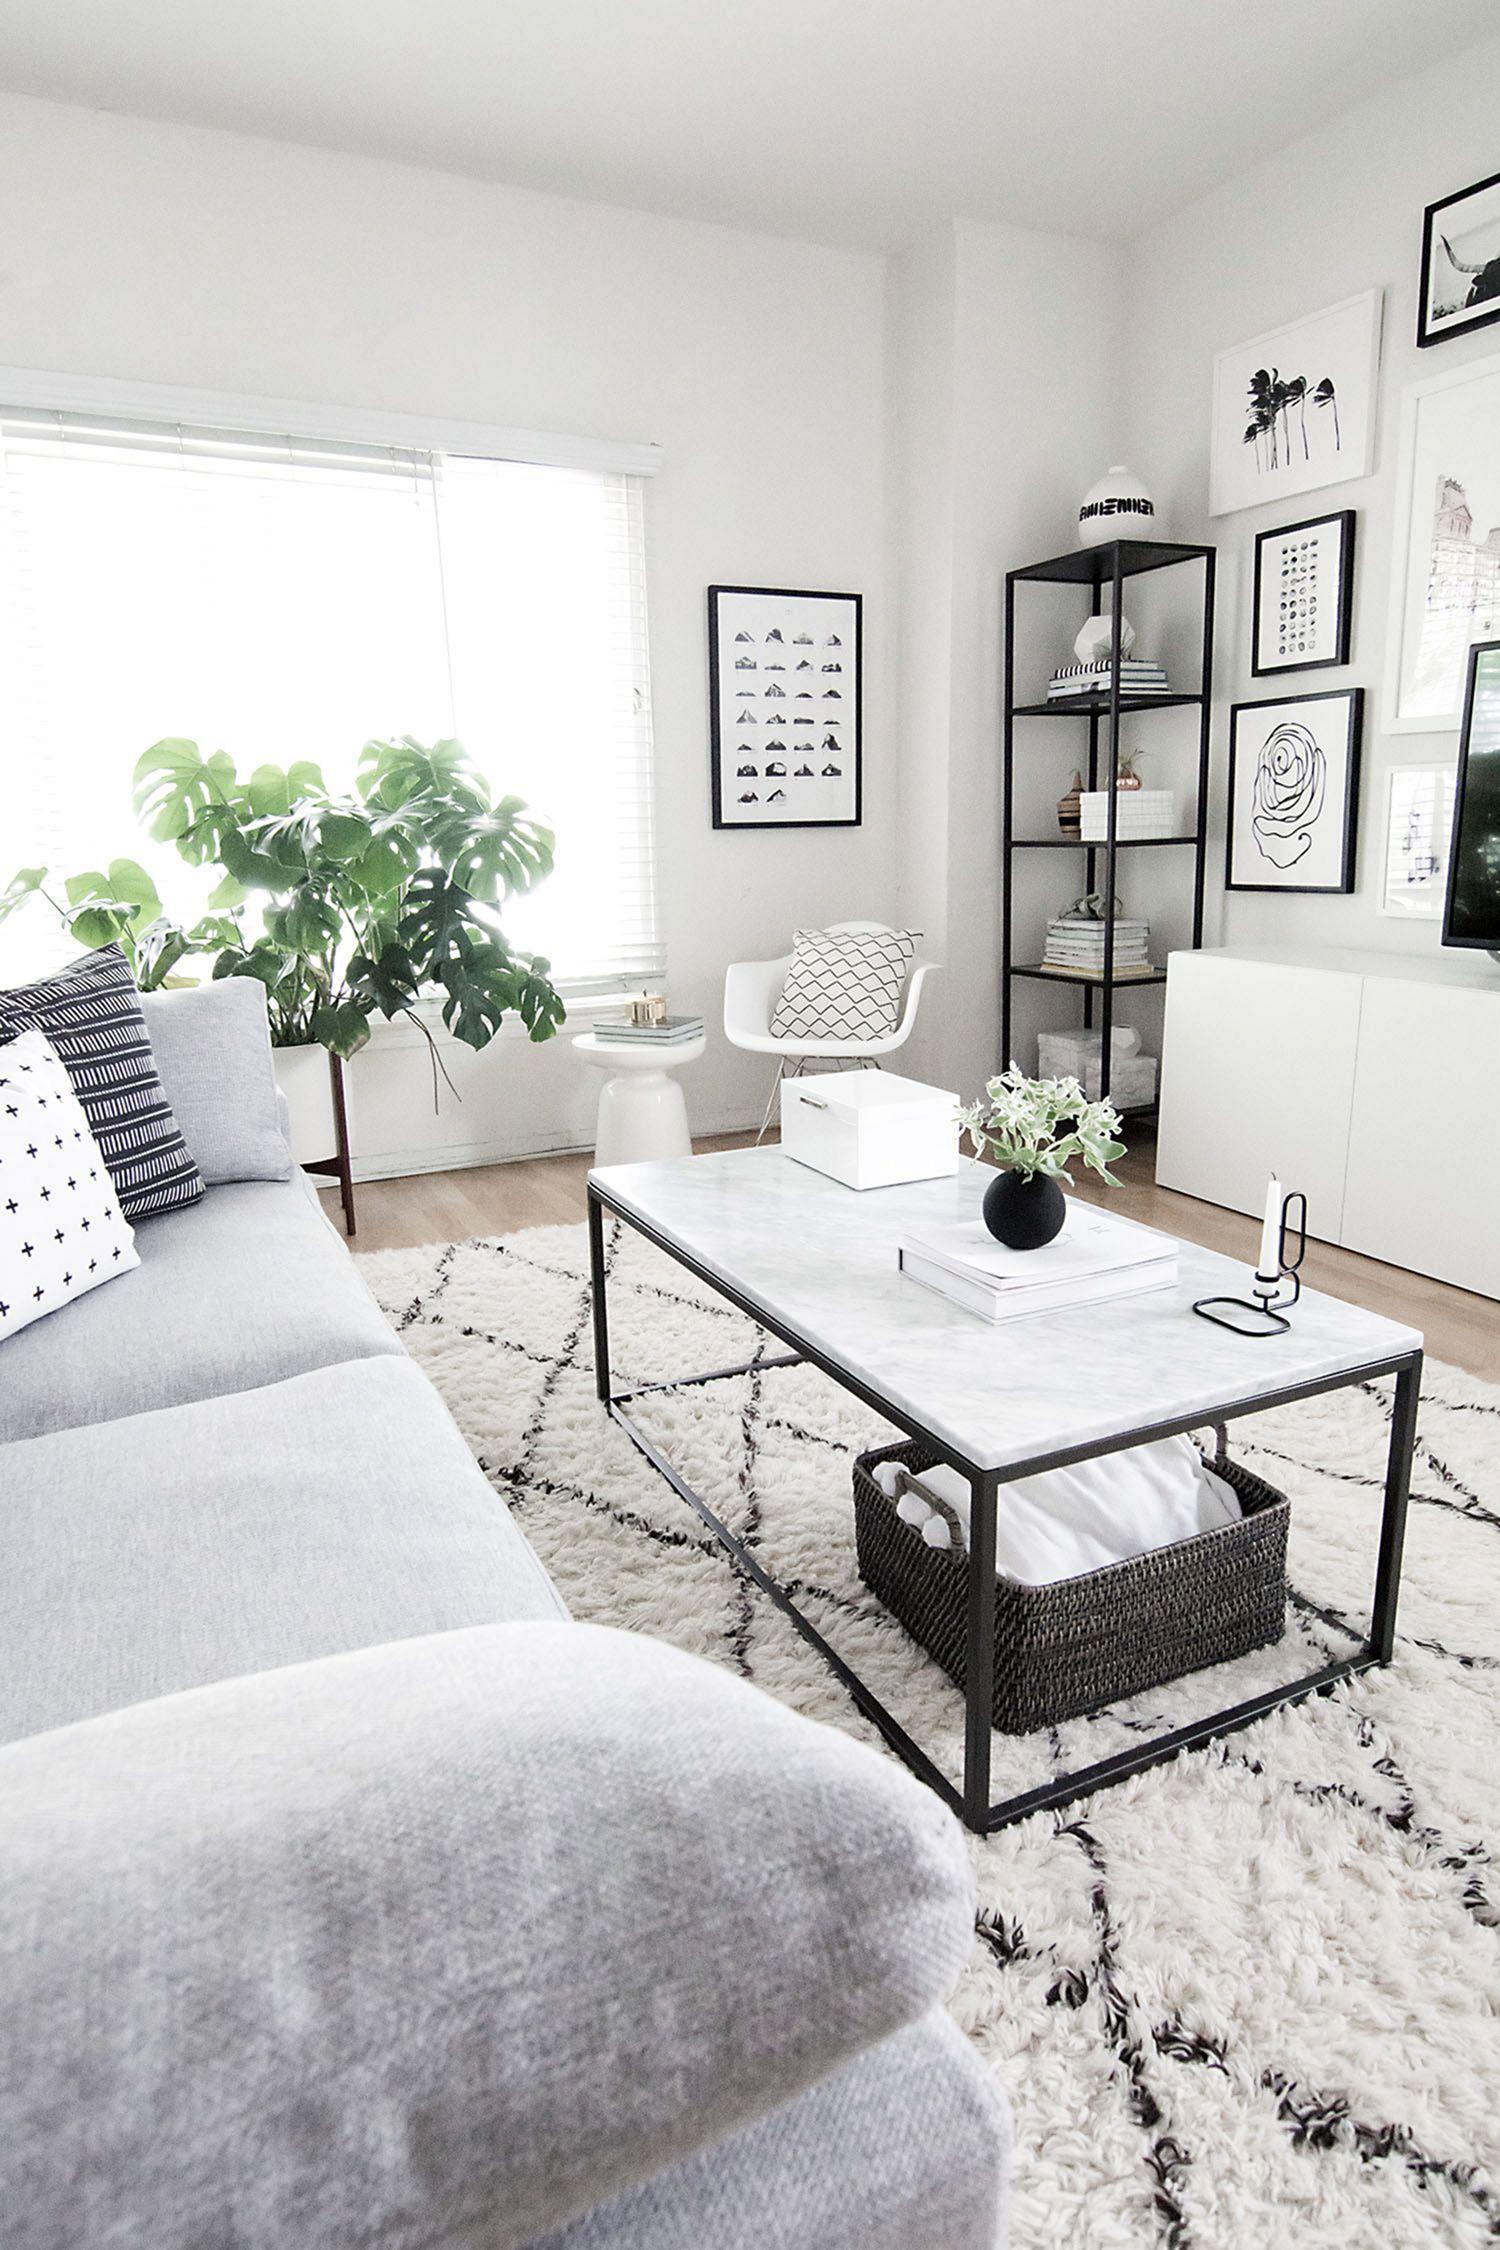 Beautiful minimalist home decor on a budget